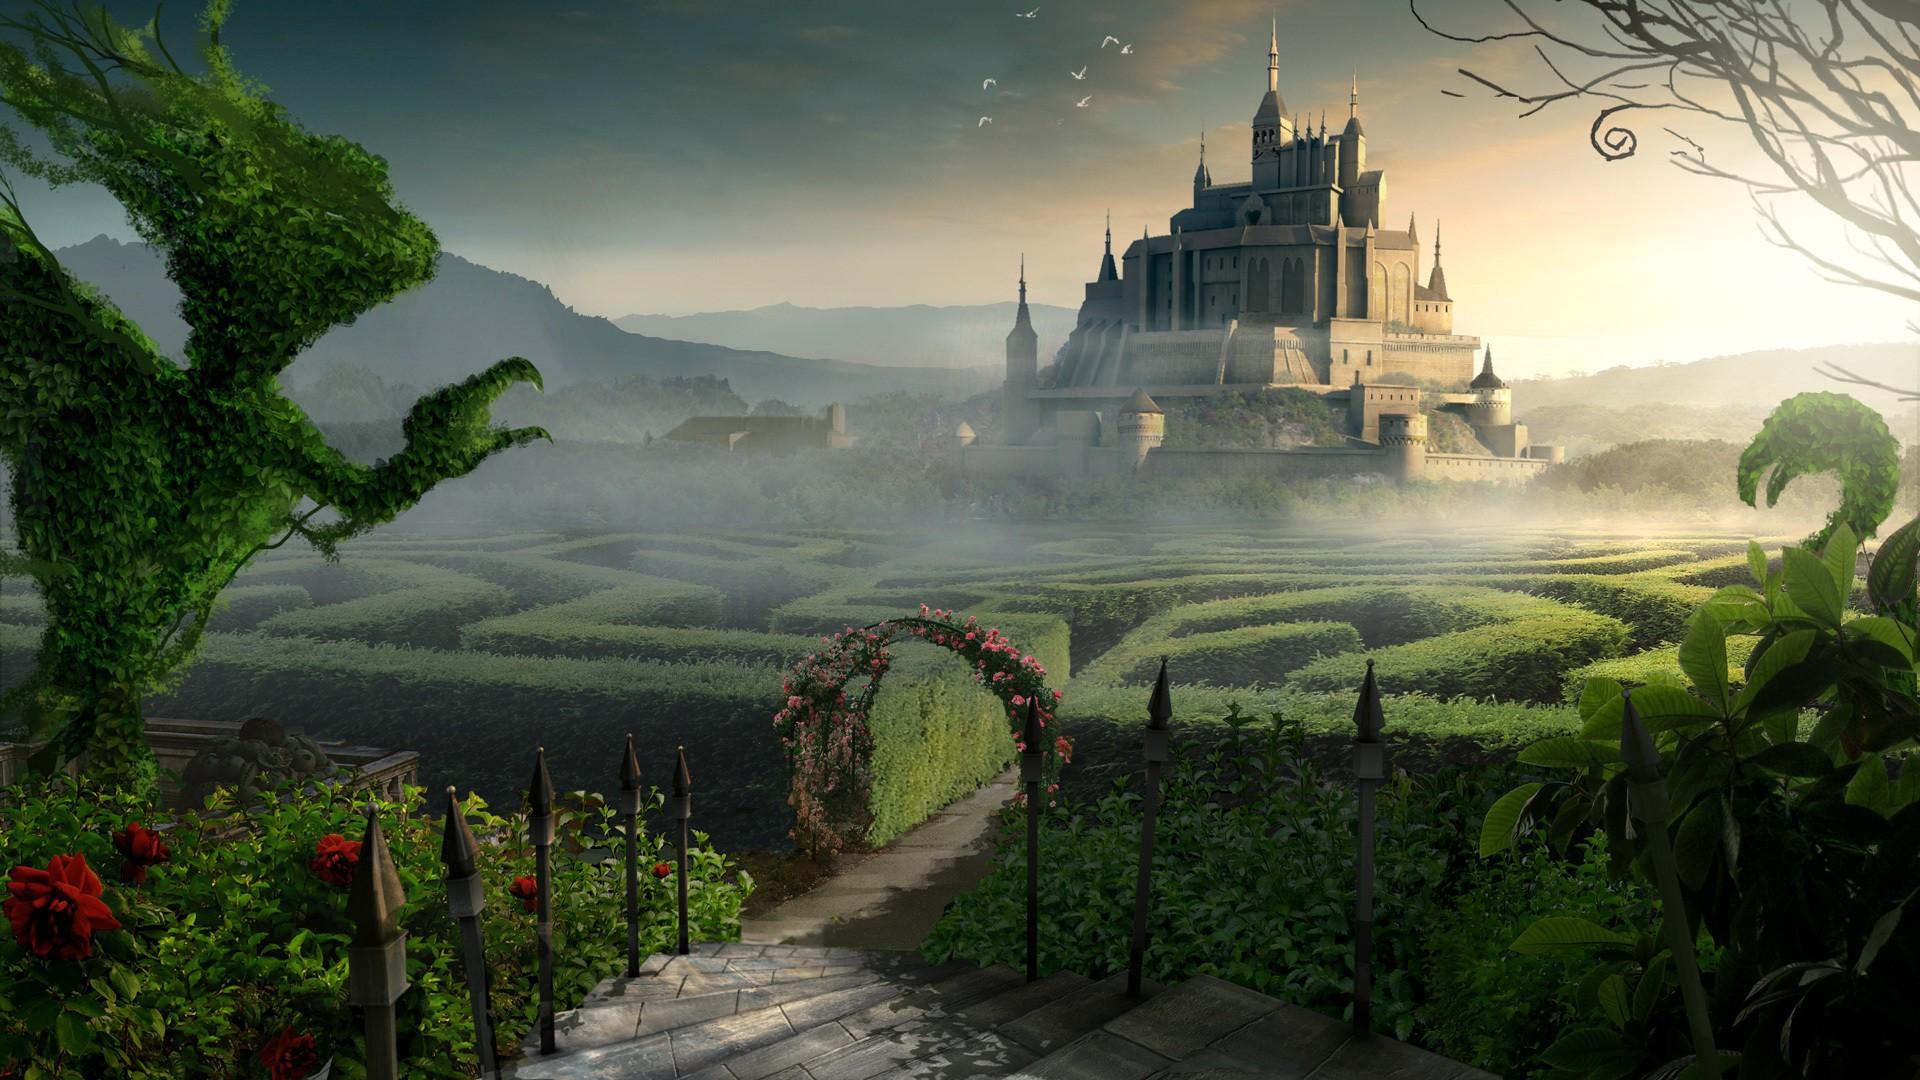 Stunning Fantasy Landscape